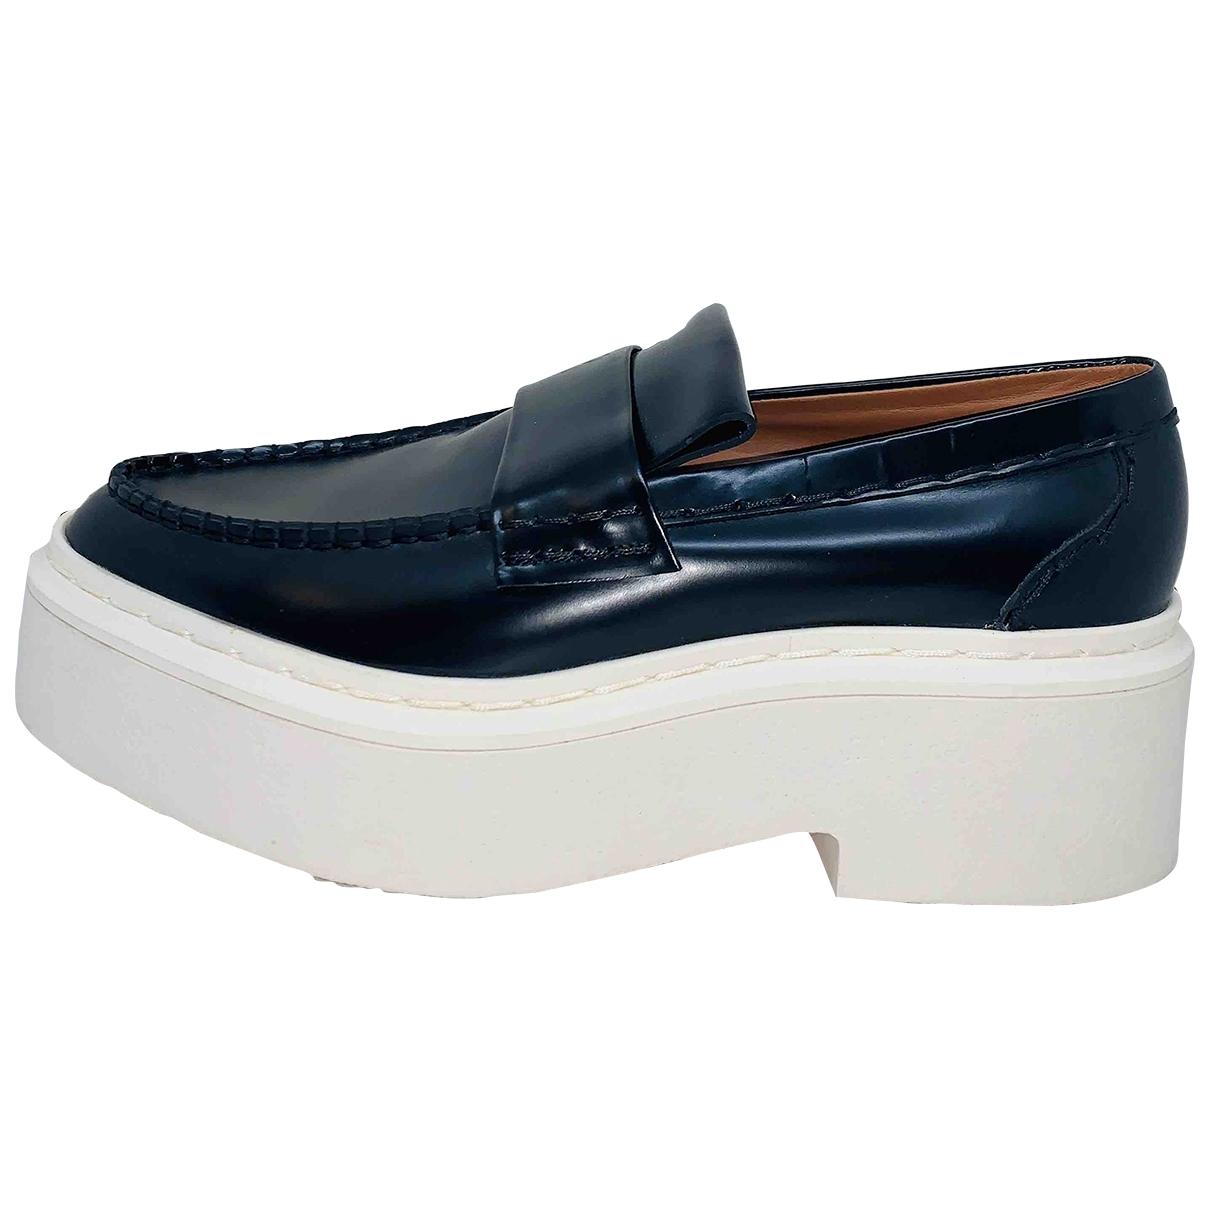 Celine \N Black Leather Flats for Women 40 EU